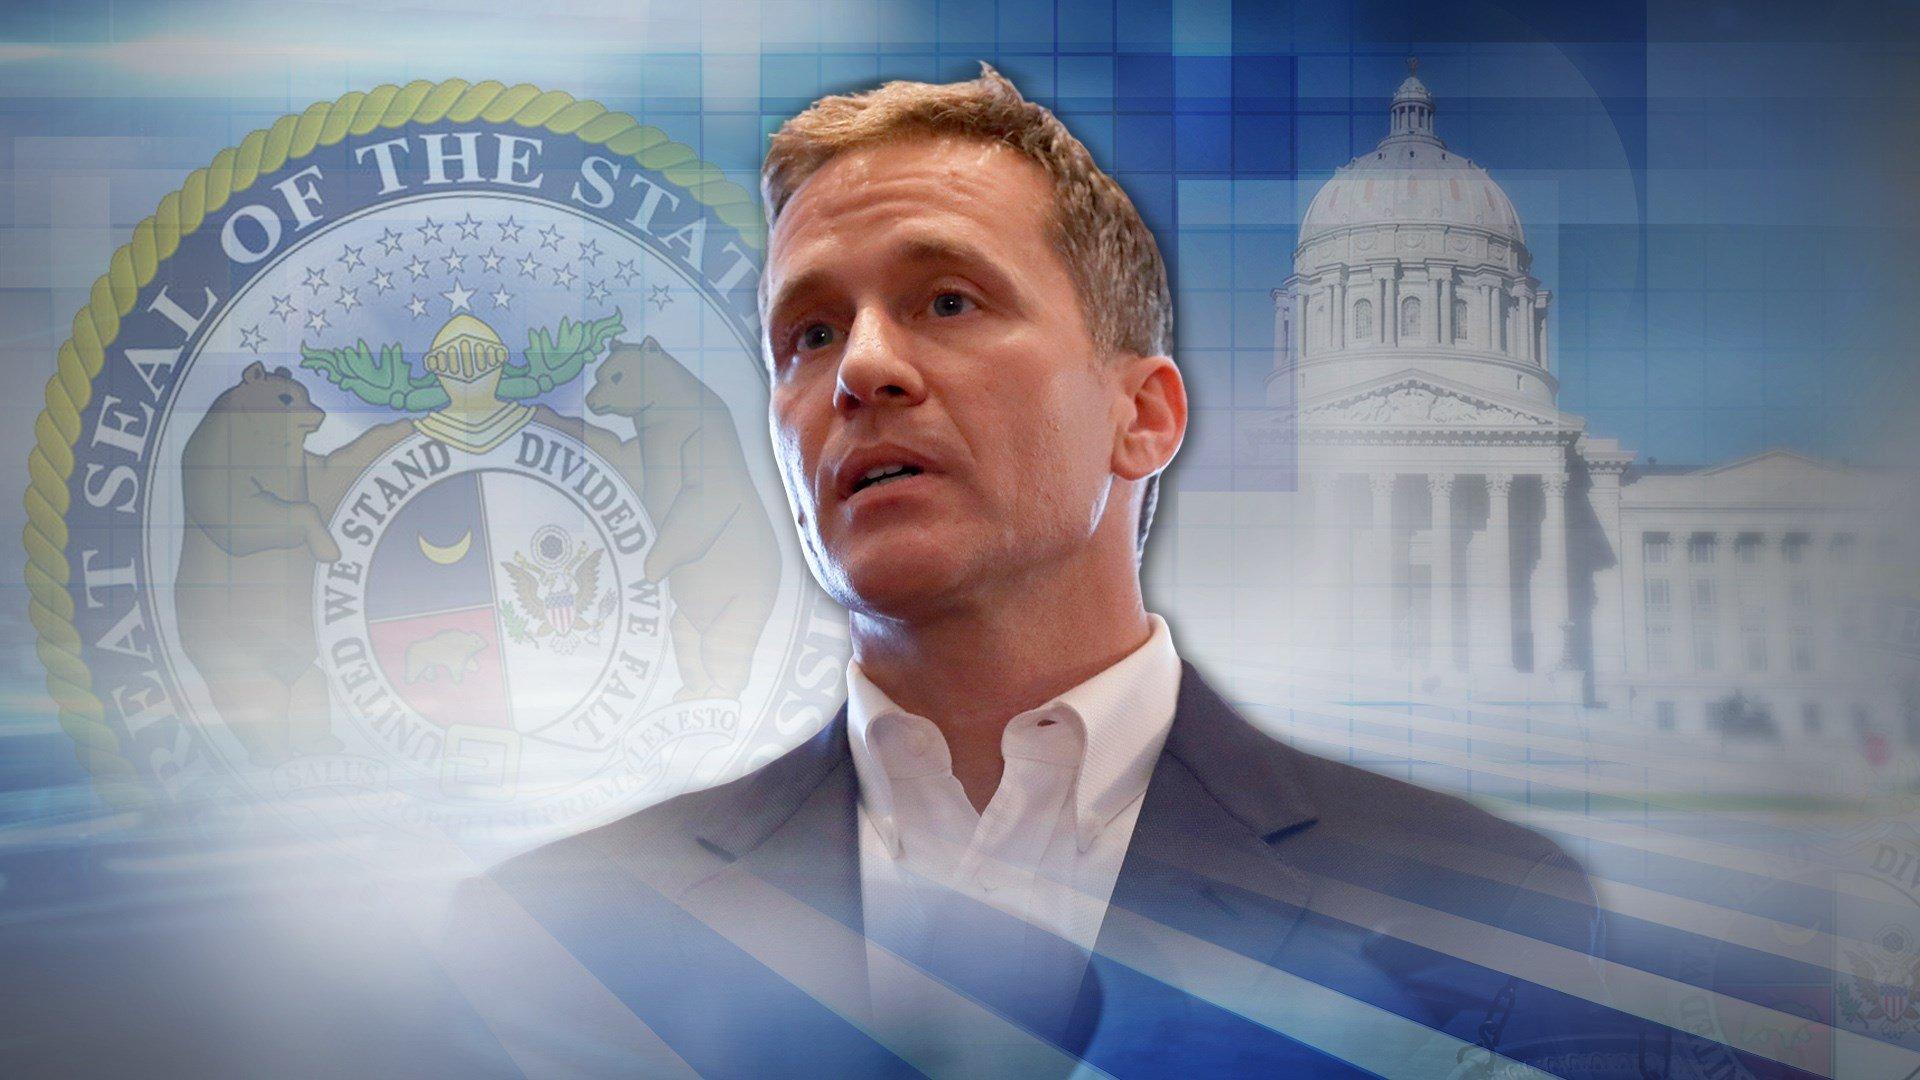 Proposed Missouri legislation flying under the radar